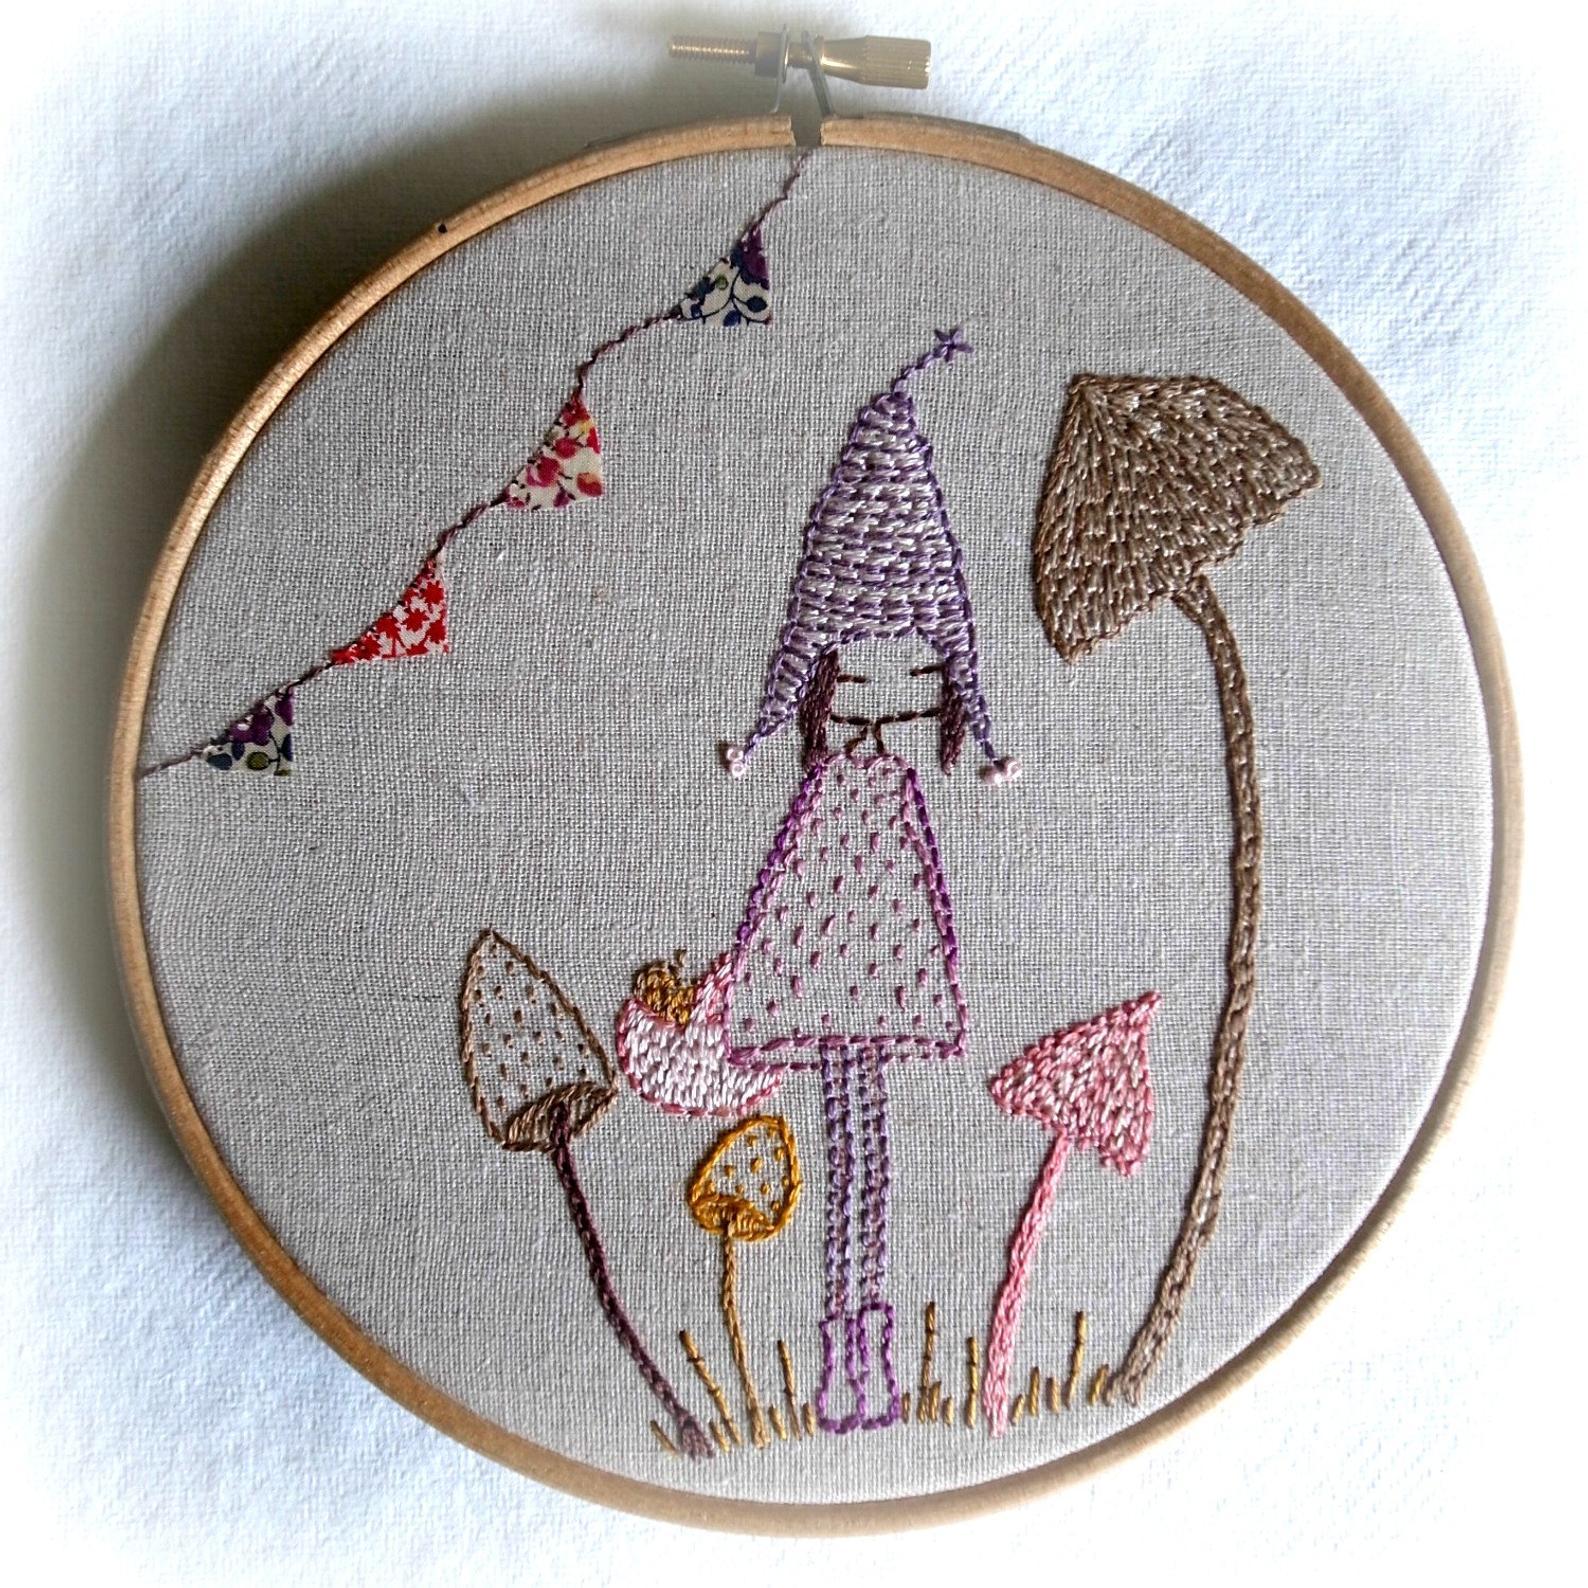 mushroom pixie hand embroidery pattern